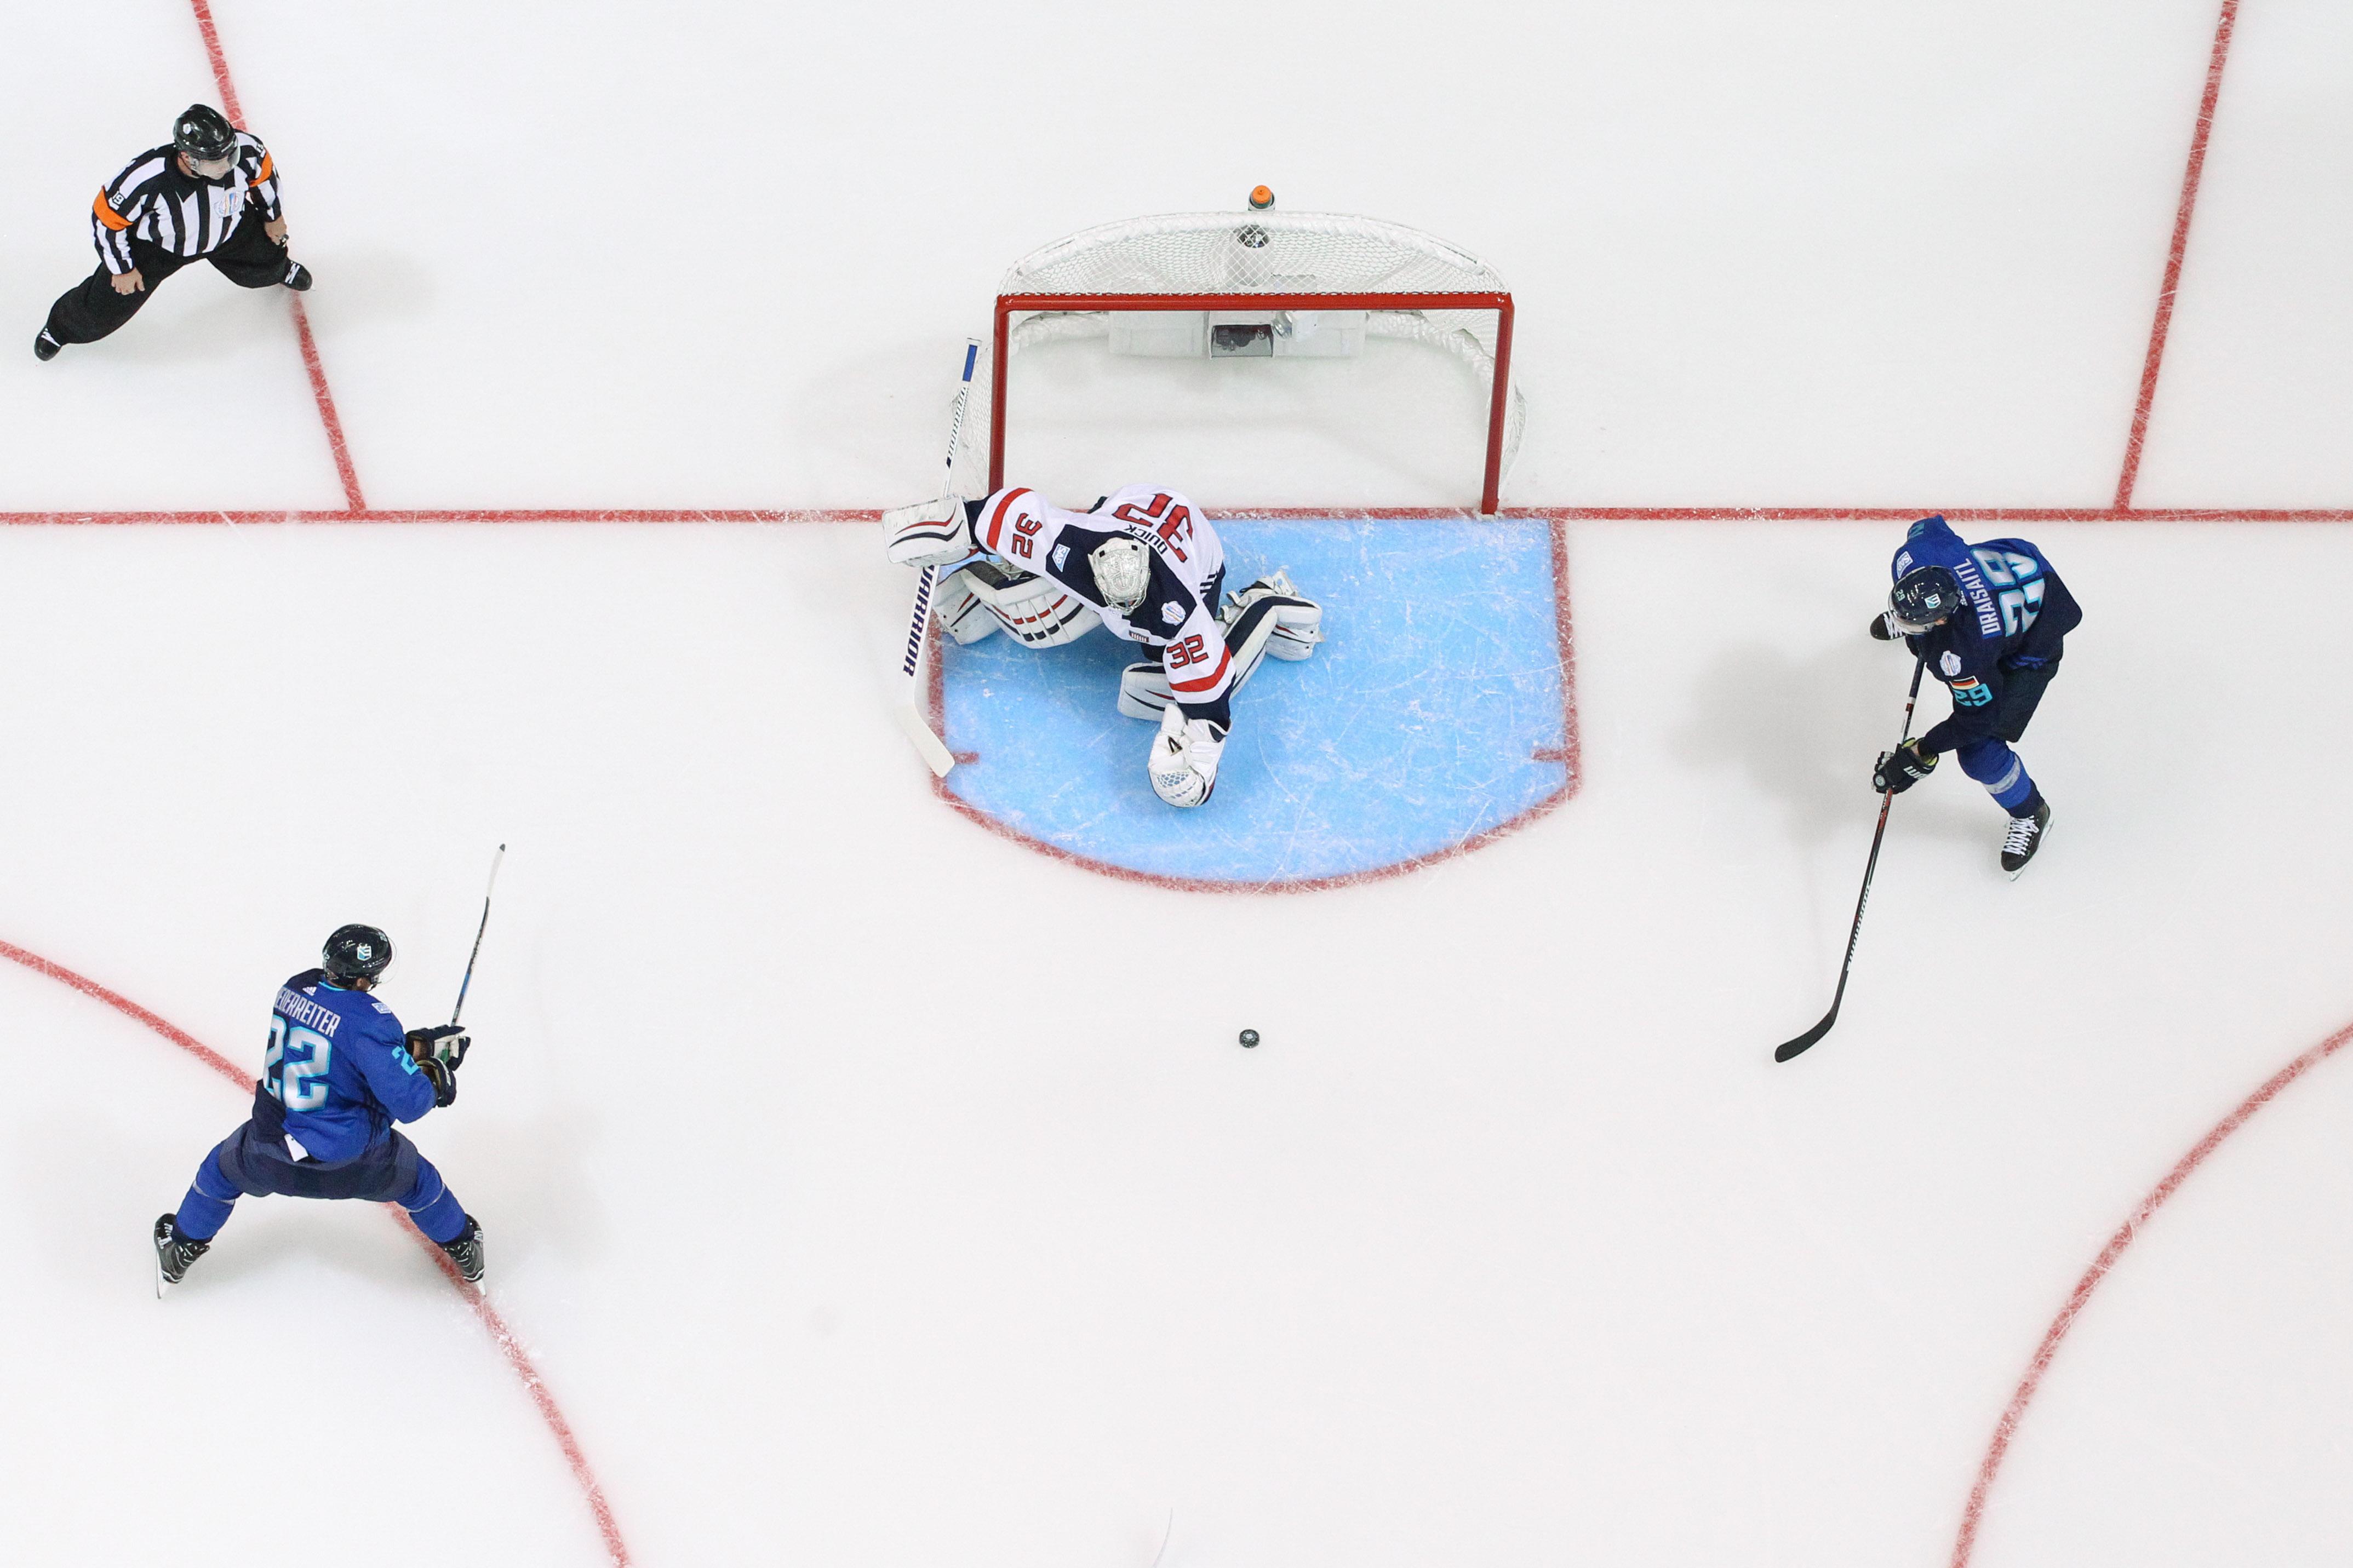 World Cup of Hockey - USA v Europe